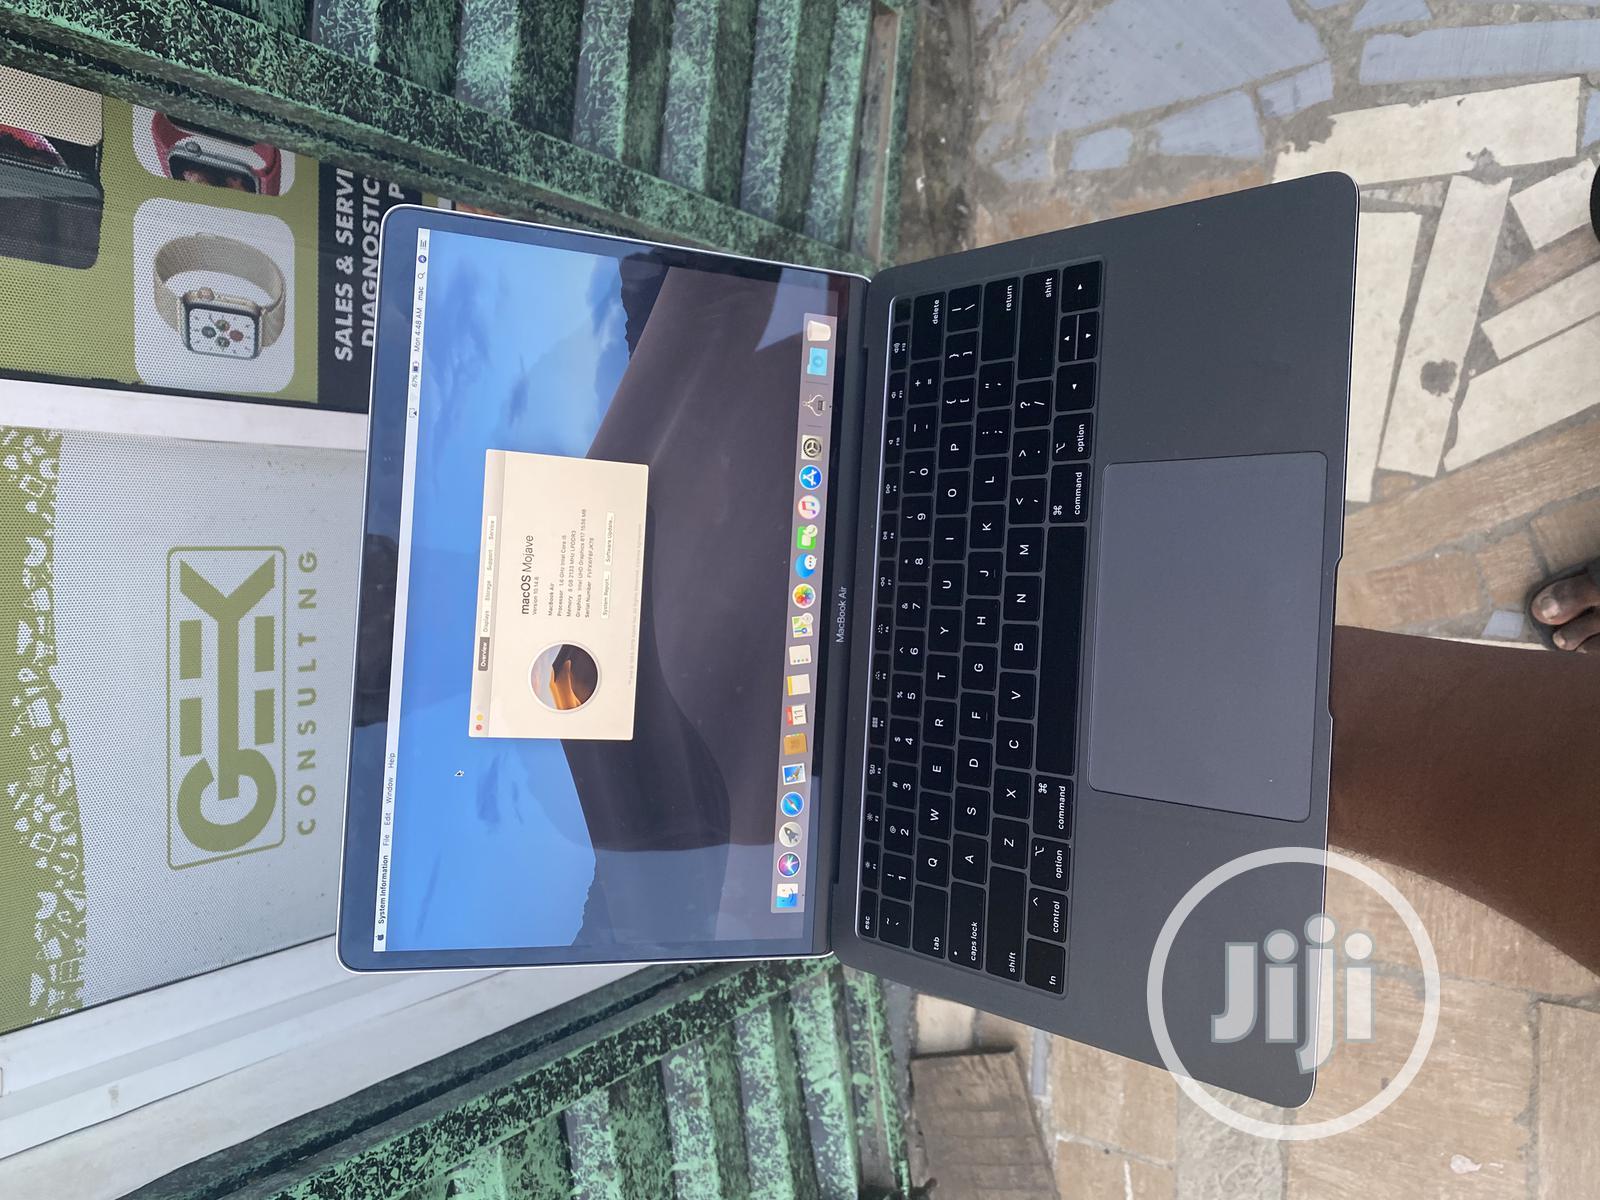 Laptop Apple MacBook Air 8GB Intel Core i5 SSD 256GB | Laptops & Computers for sale in Lekki, Lagos State, Nigeria